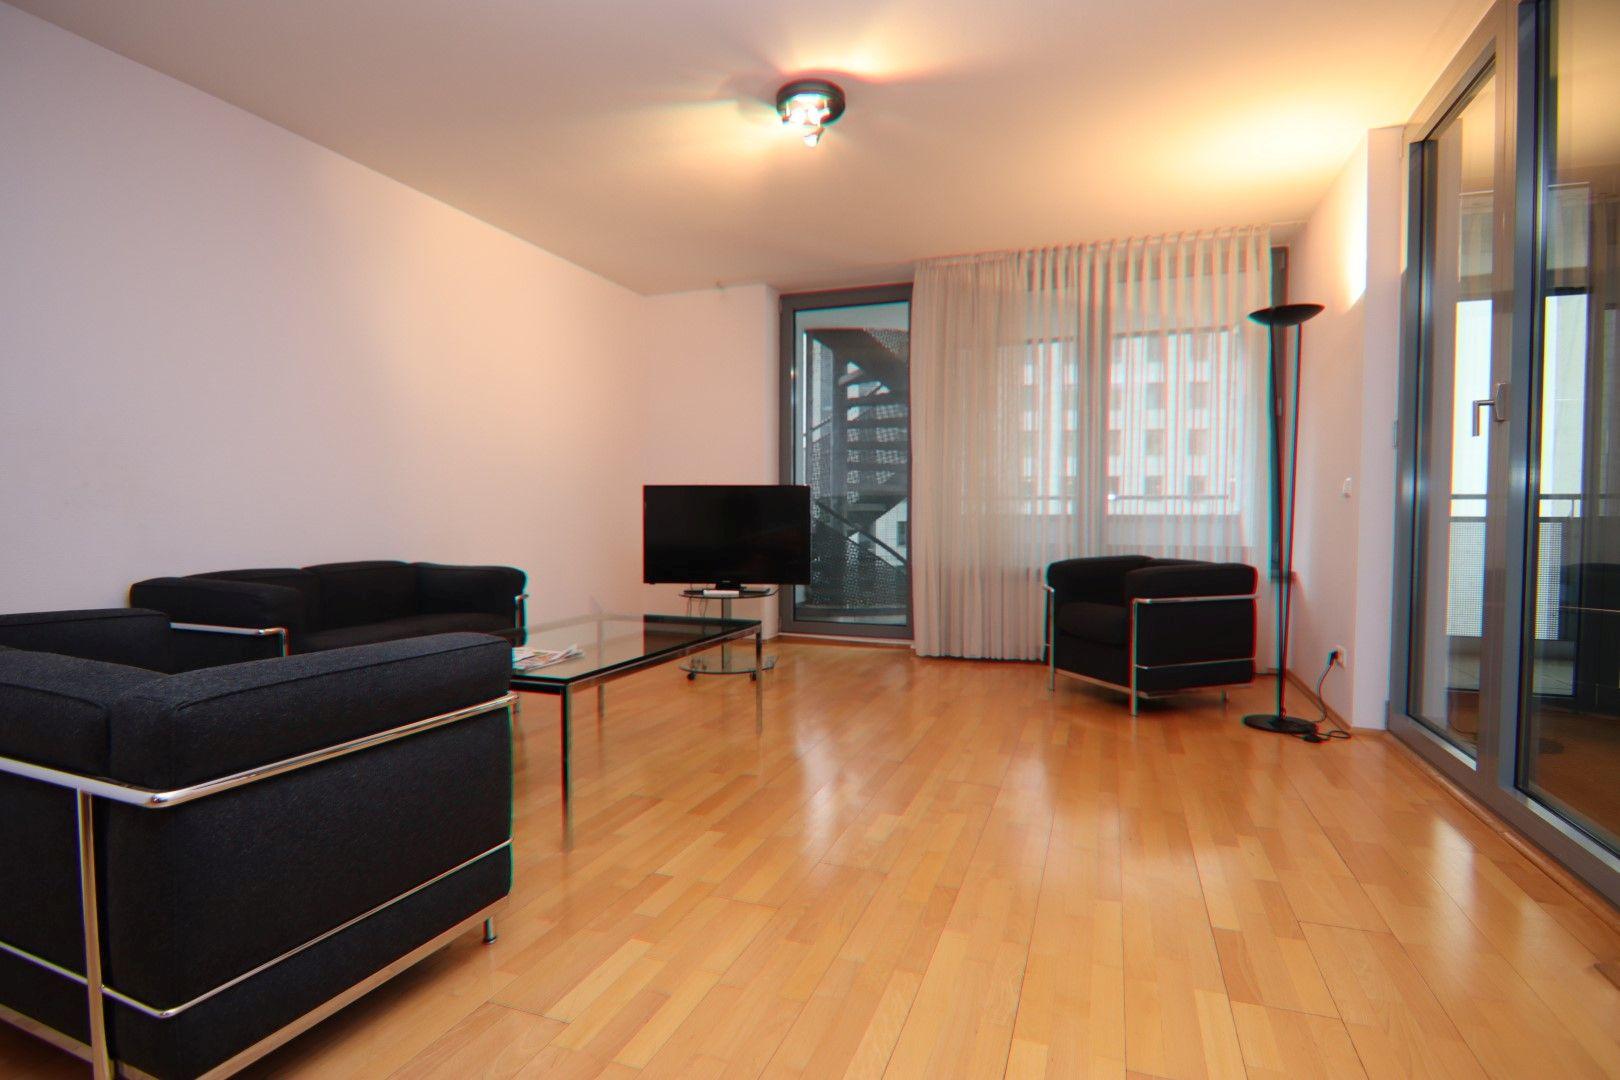 Immobilie Nr.0280 | Am Bonneshof 11, 40474 Düsseldorf